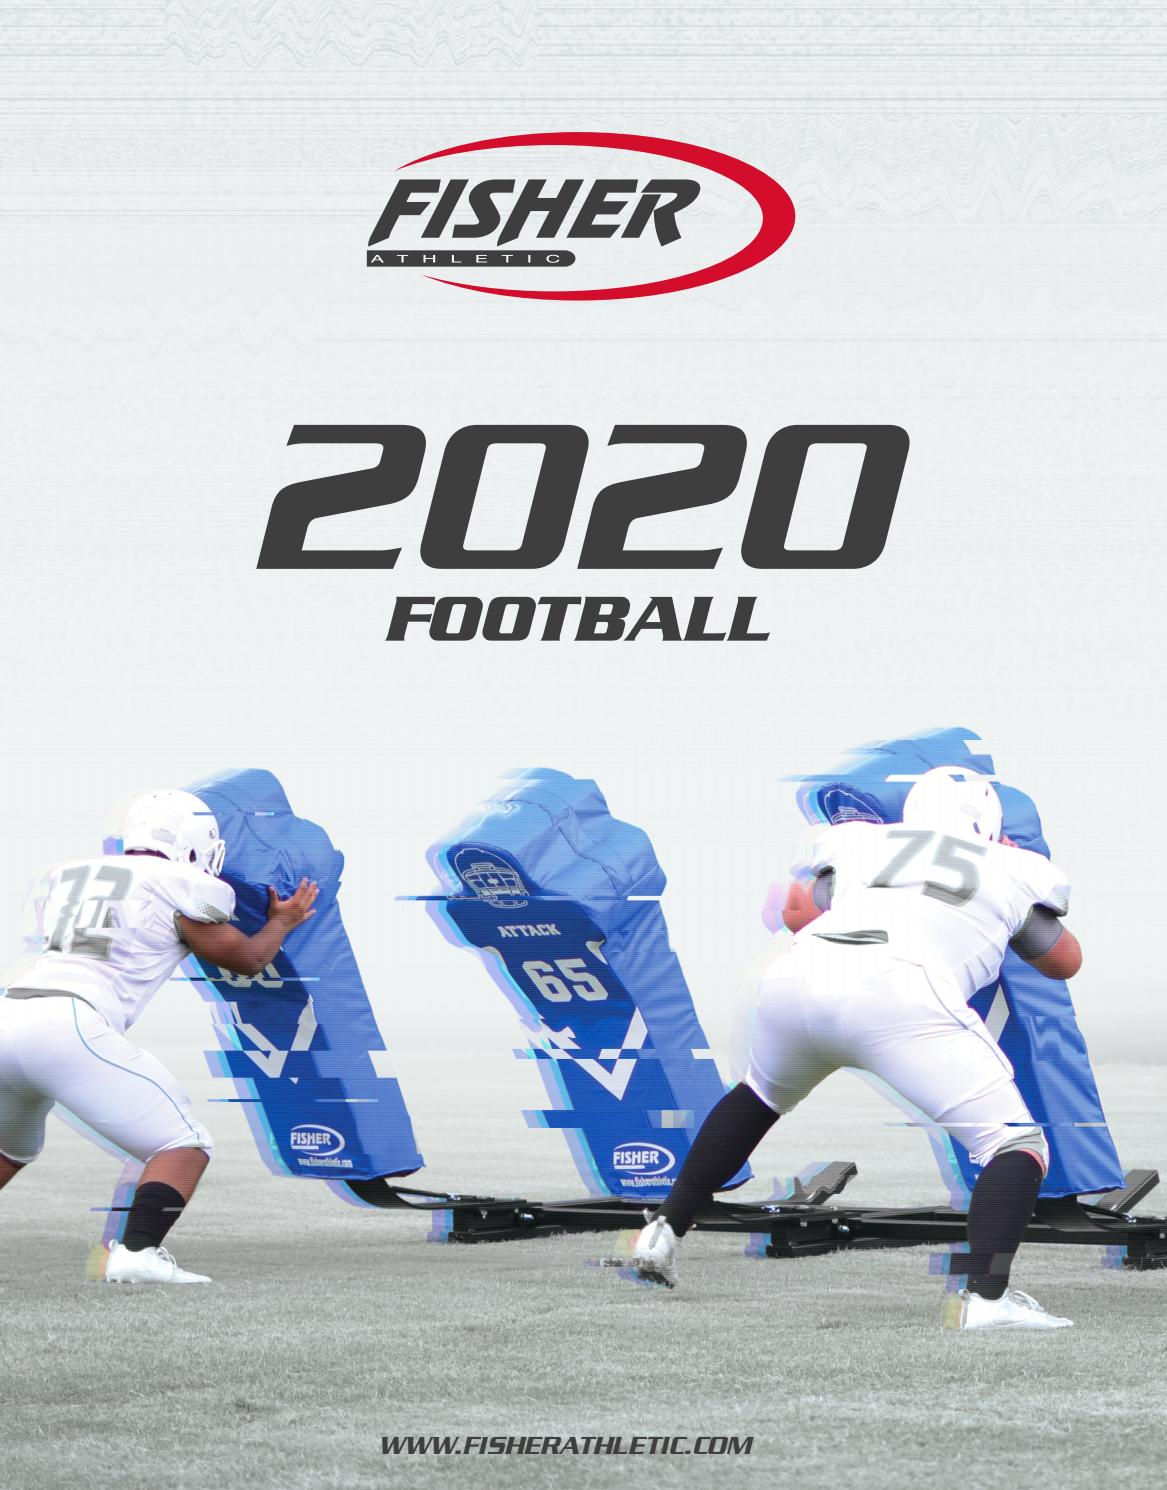 HD-400 NEW Fisher Forearm Shield Football Black 1 Pair